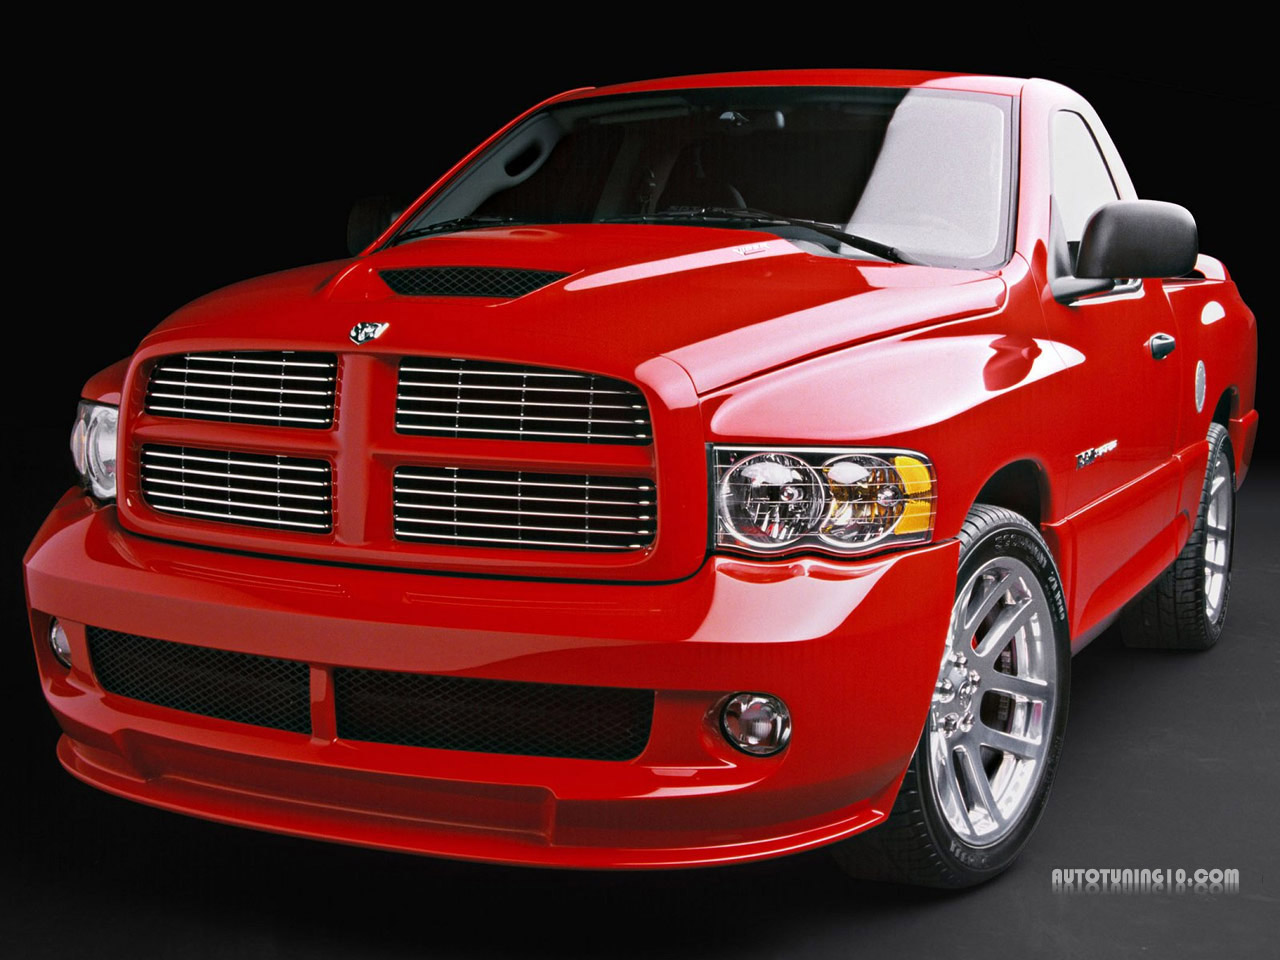 Dodge Ram Wallpaper 4530 Hd Wallpapers in Cars   Imagescicom 1280x960